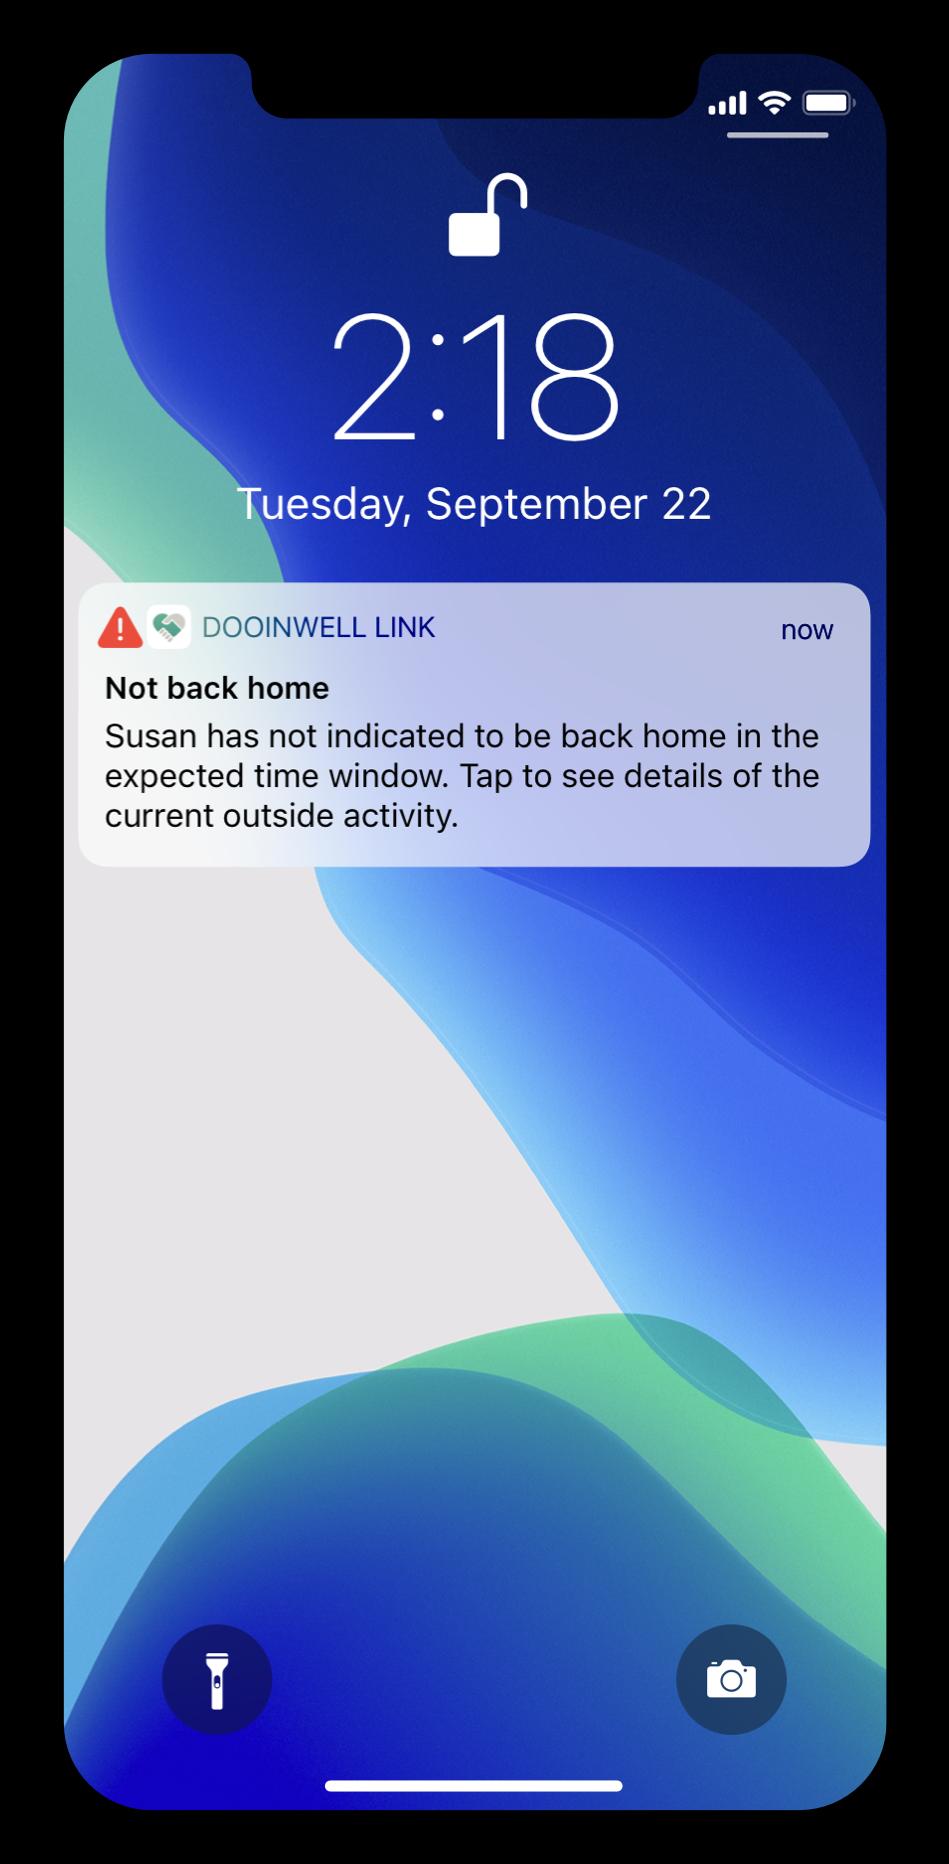 Dooinwell alert on an iPhone lock screen